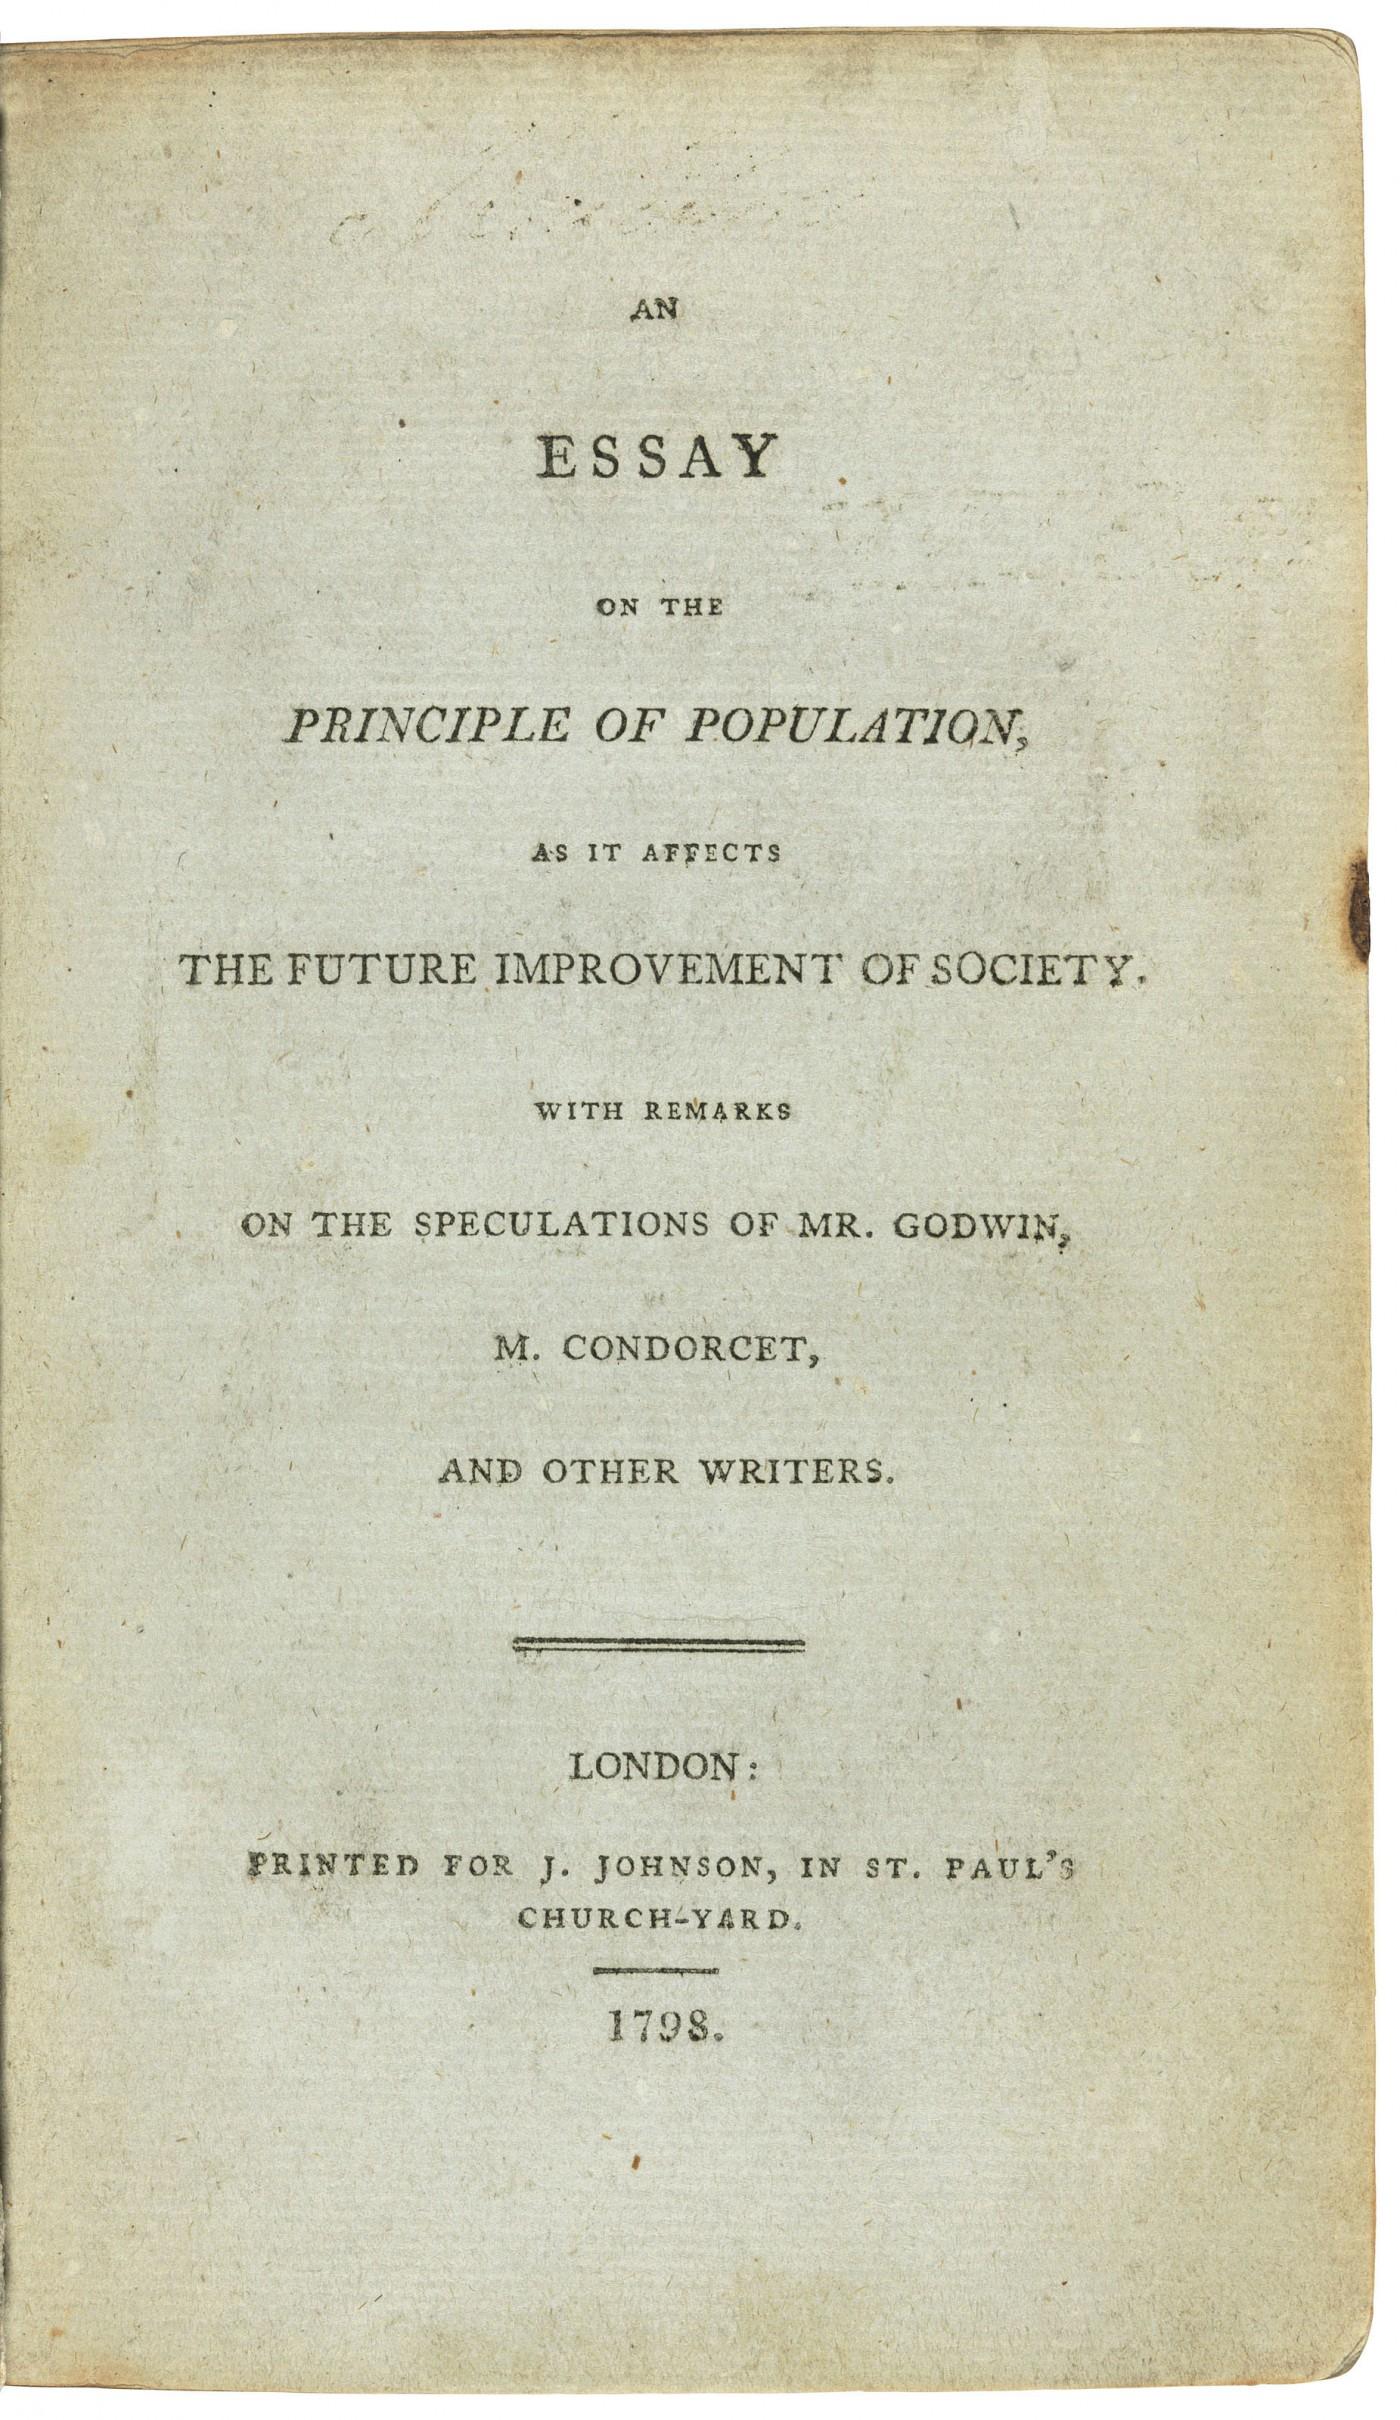 013 2018 Cks 16018 0261 000malthus Thomas Robert An Essay On The Principle Of As It Af Example Singular Population Malthus Sparknotes Main Idea 1400